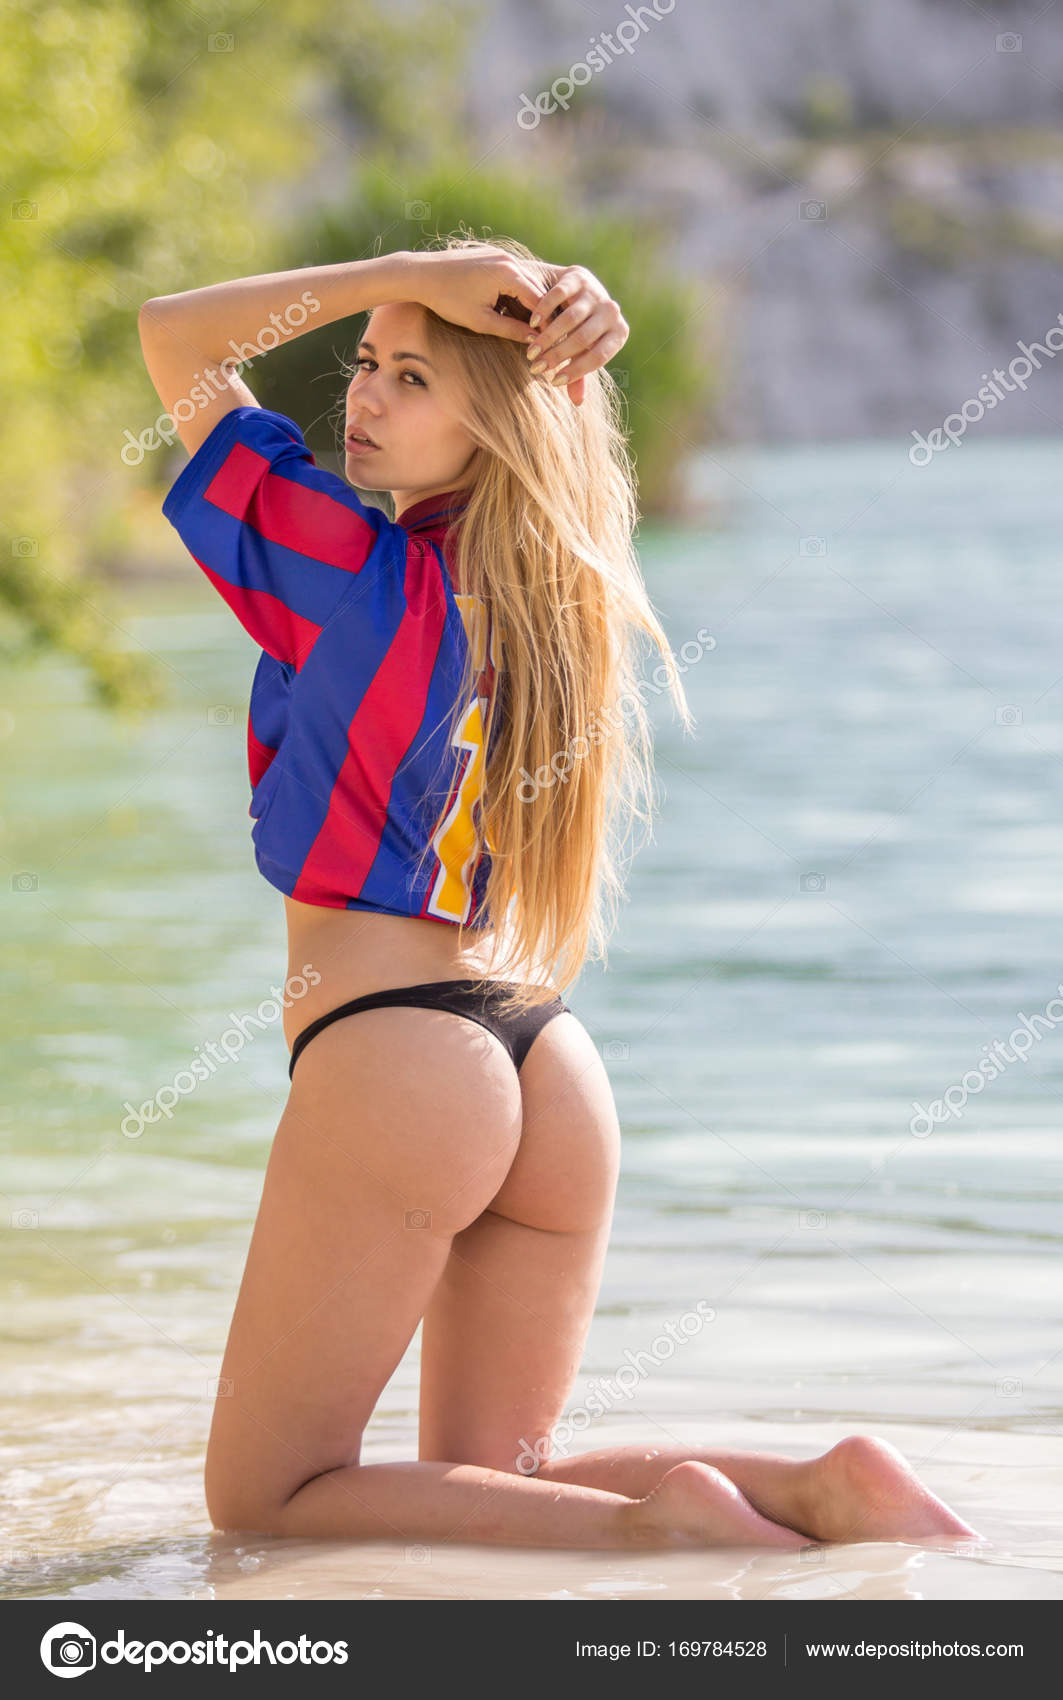 Imágenes Chicas Sexis 2017 En Bikini Mujer Sexy En Bikini